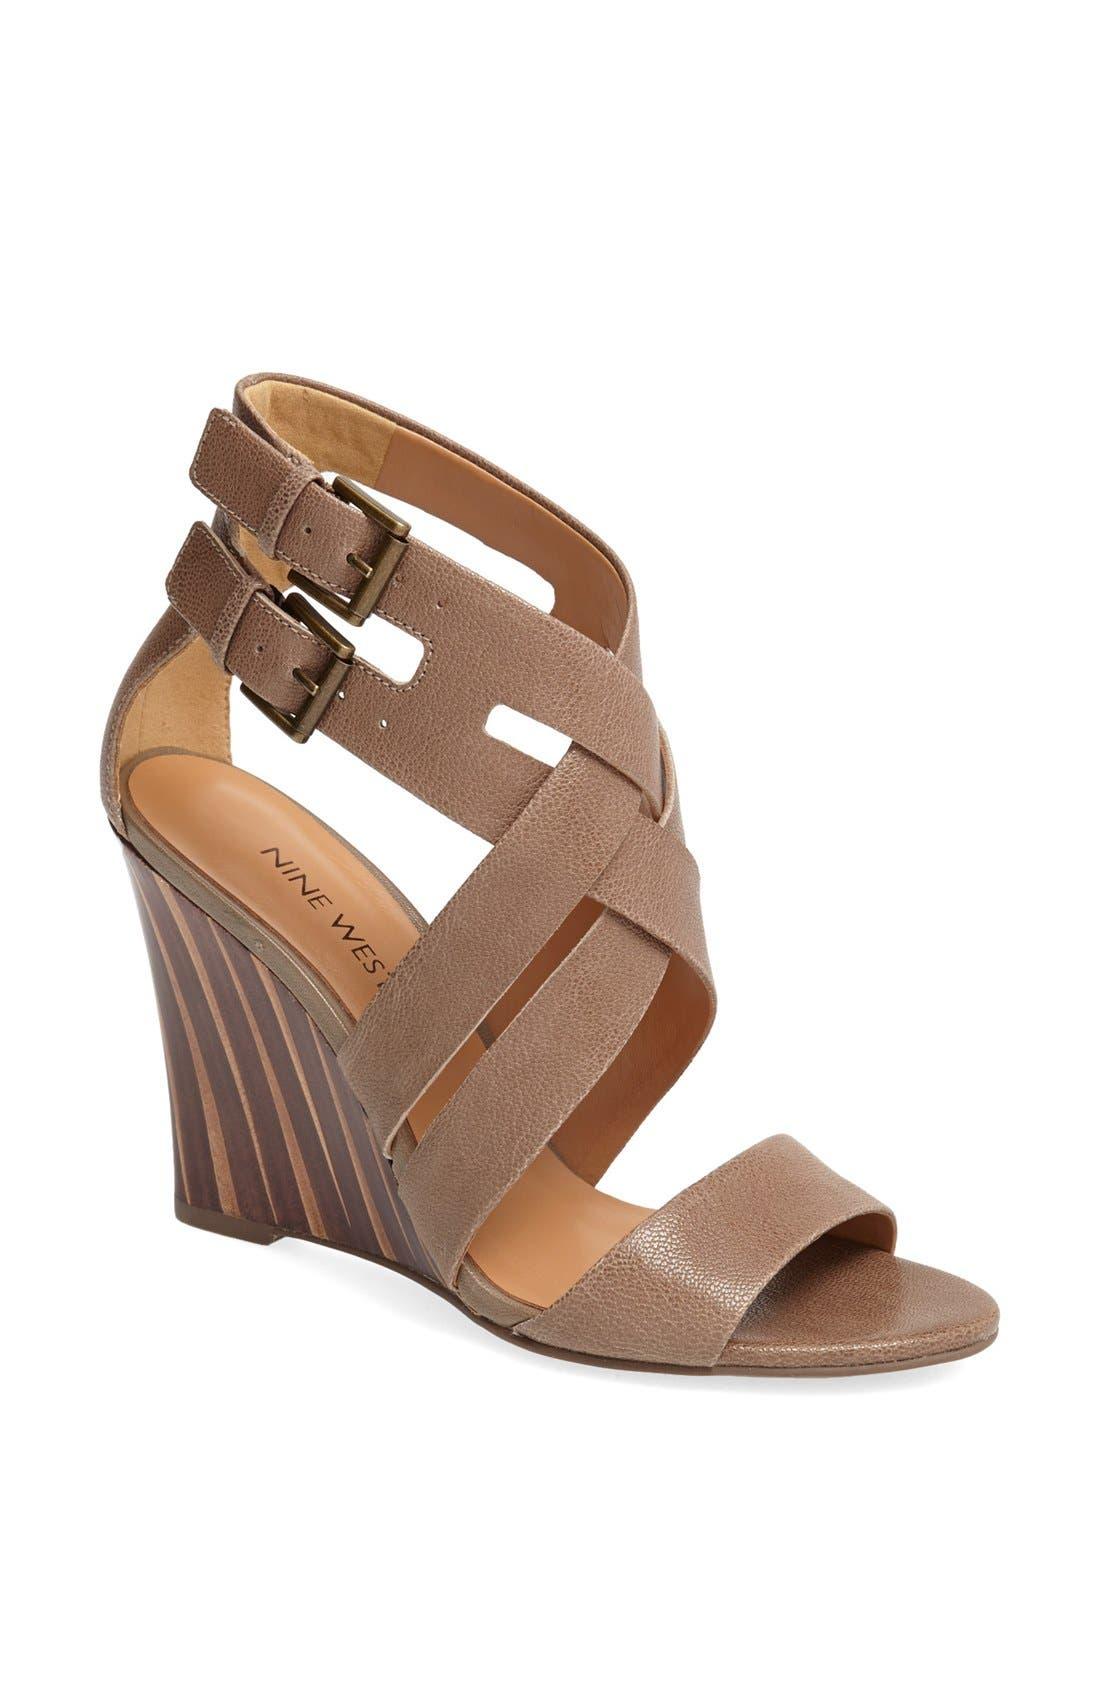 Main Image - Nine West 'Maureen' Wedge Sandal